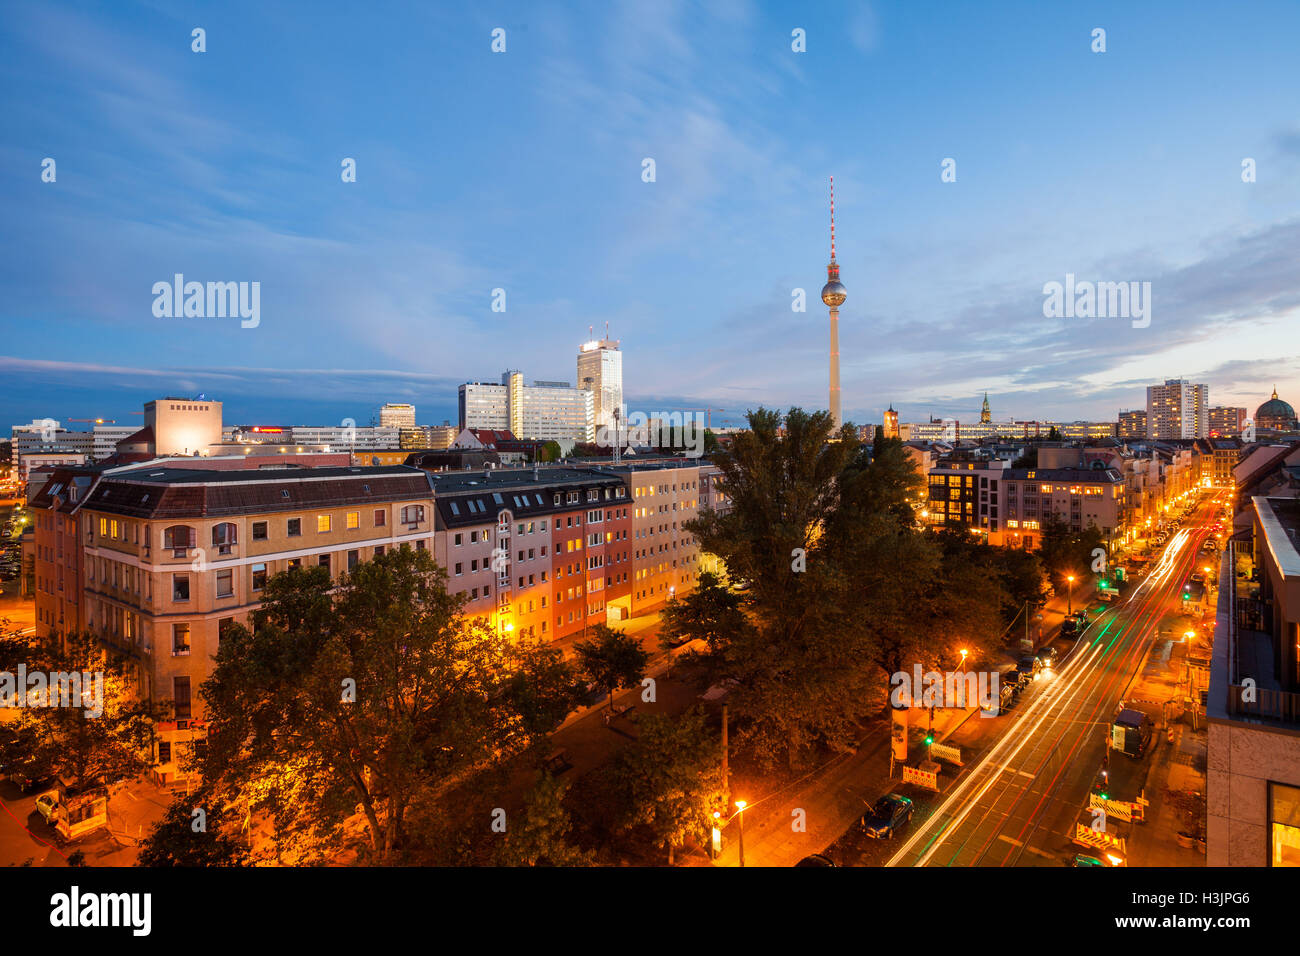 Berlin's Alexanderplatz and Fernsehturm at twilight Stock Photo